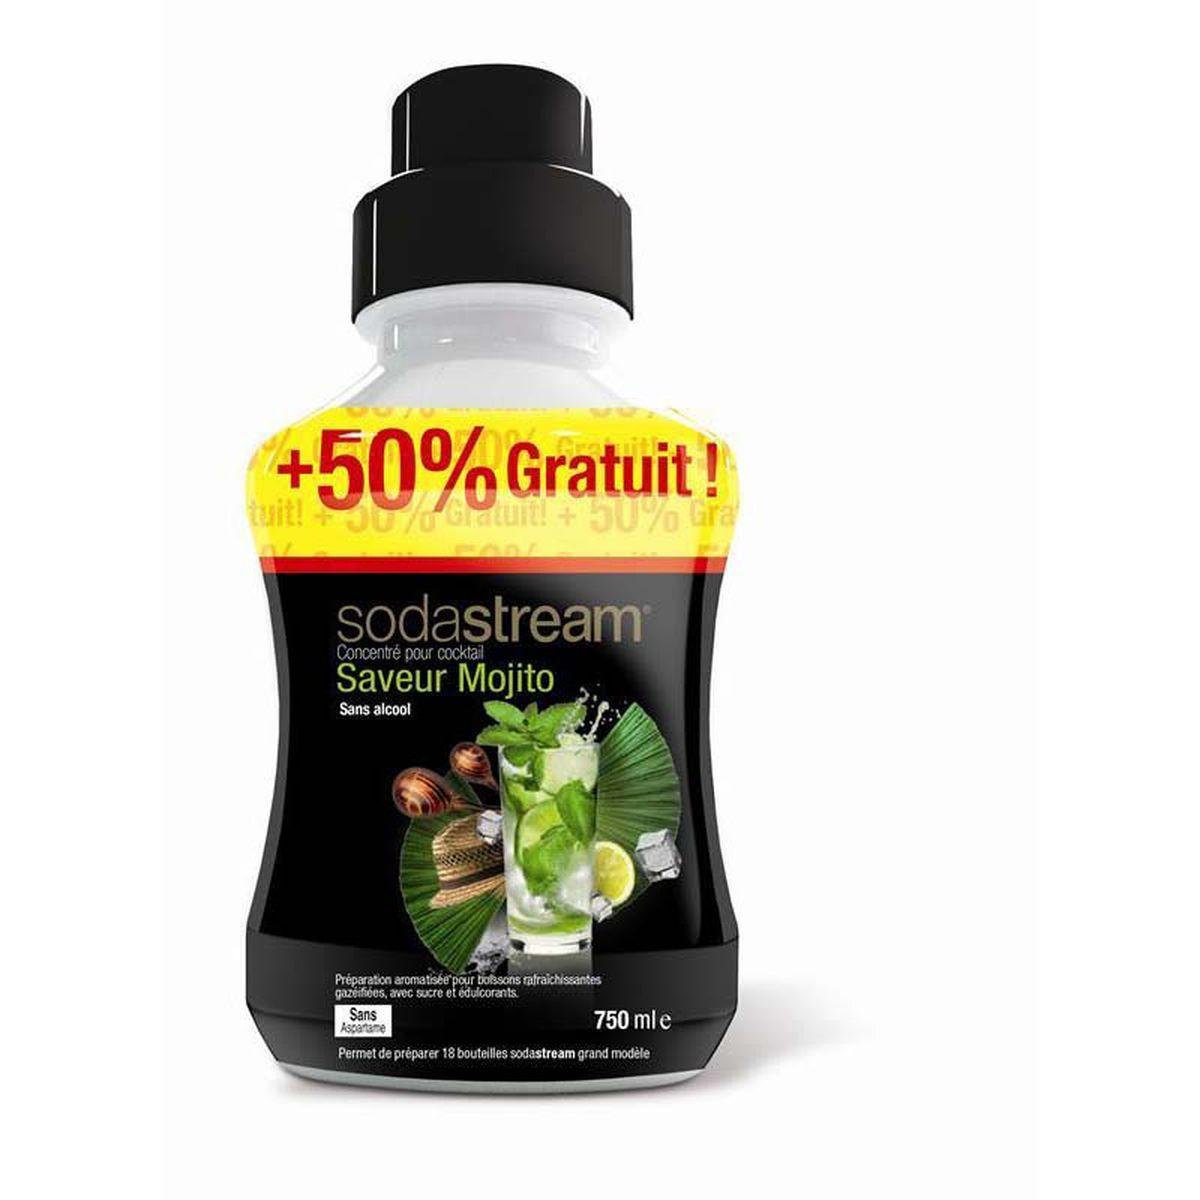 Bouteille sodastream pas cher elegant pas les sirops sodastream qui sont chres et franchement - Sirop sodastream pas cher ...